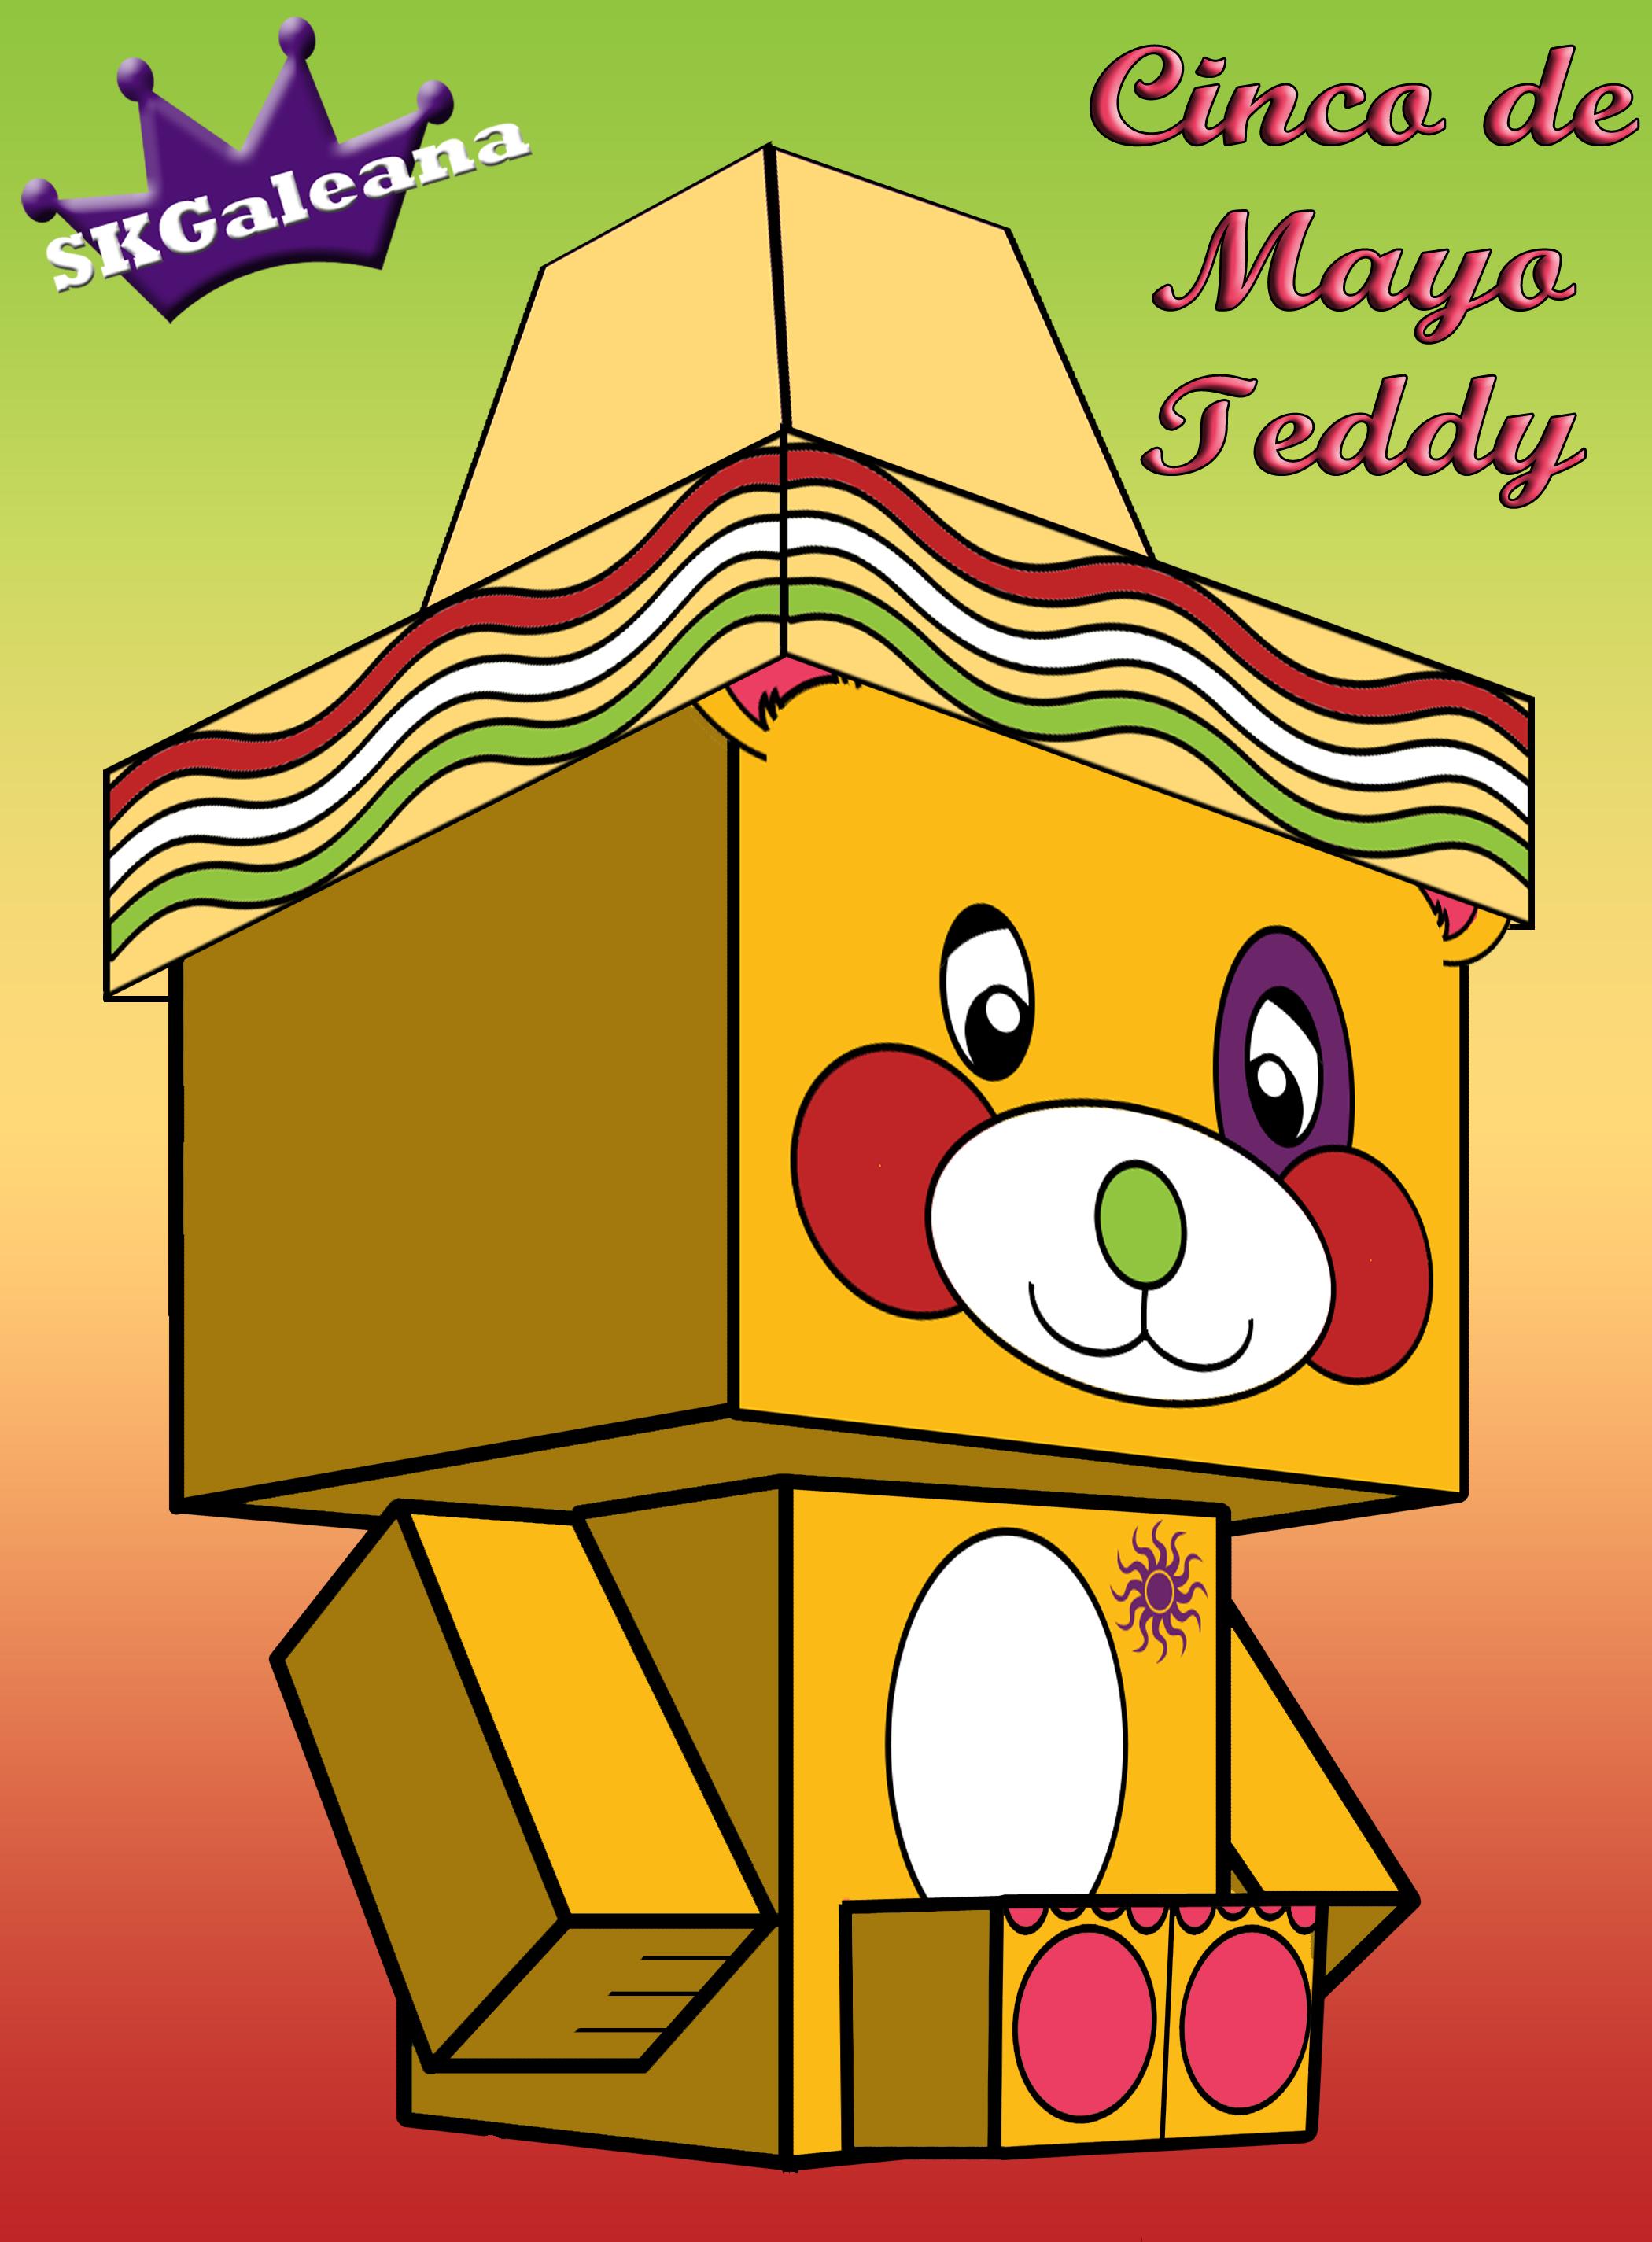 Teddy cinco de mayo by SKGaleana